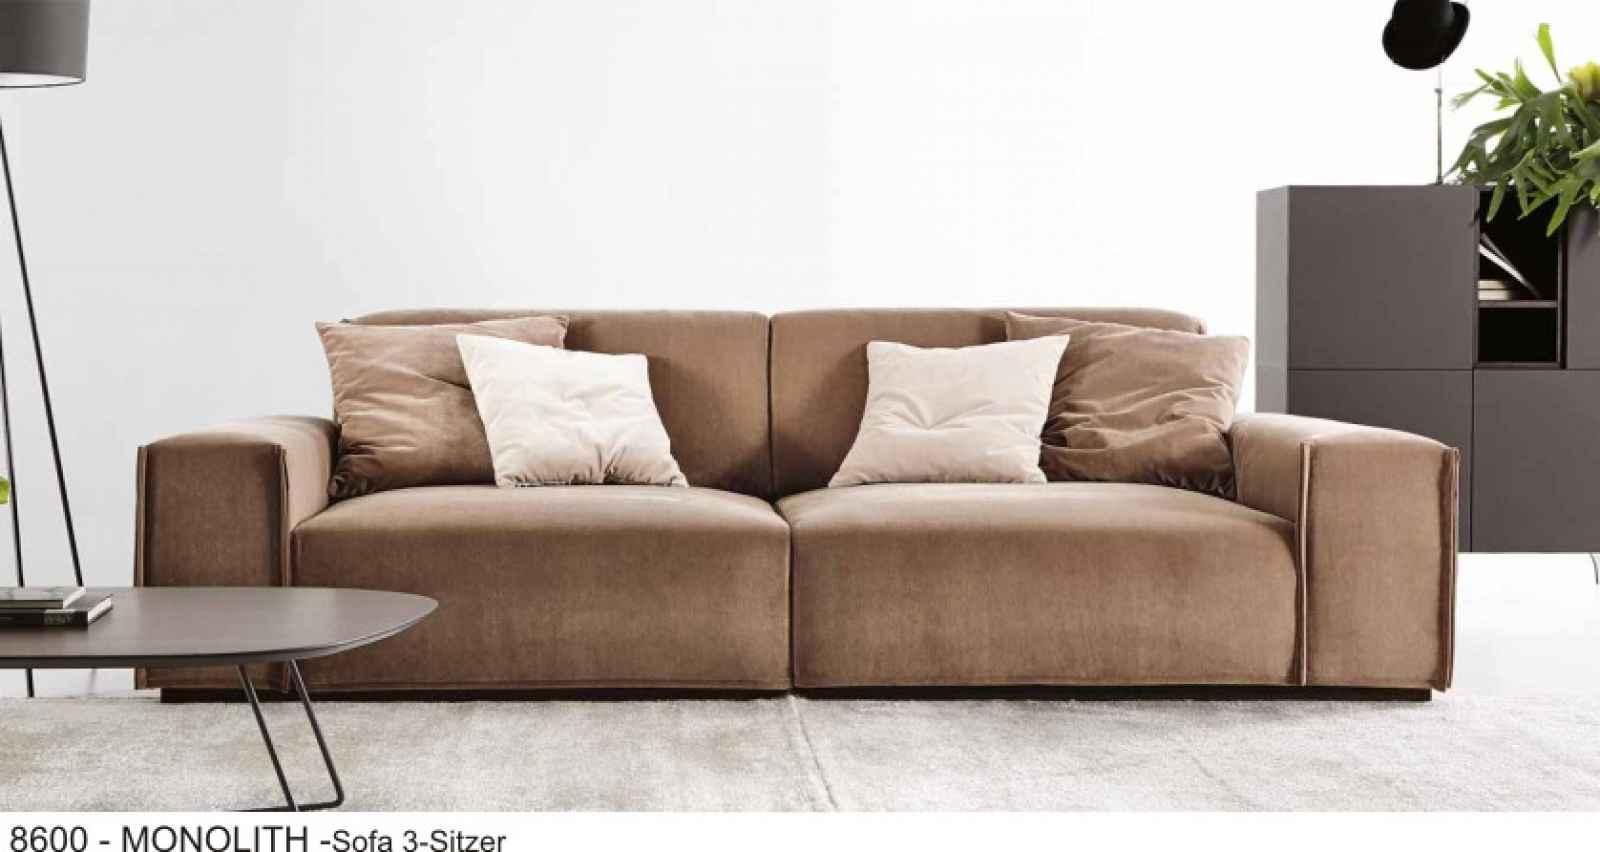 Sofa 8600 Ditreitalia MONOLITH